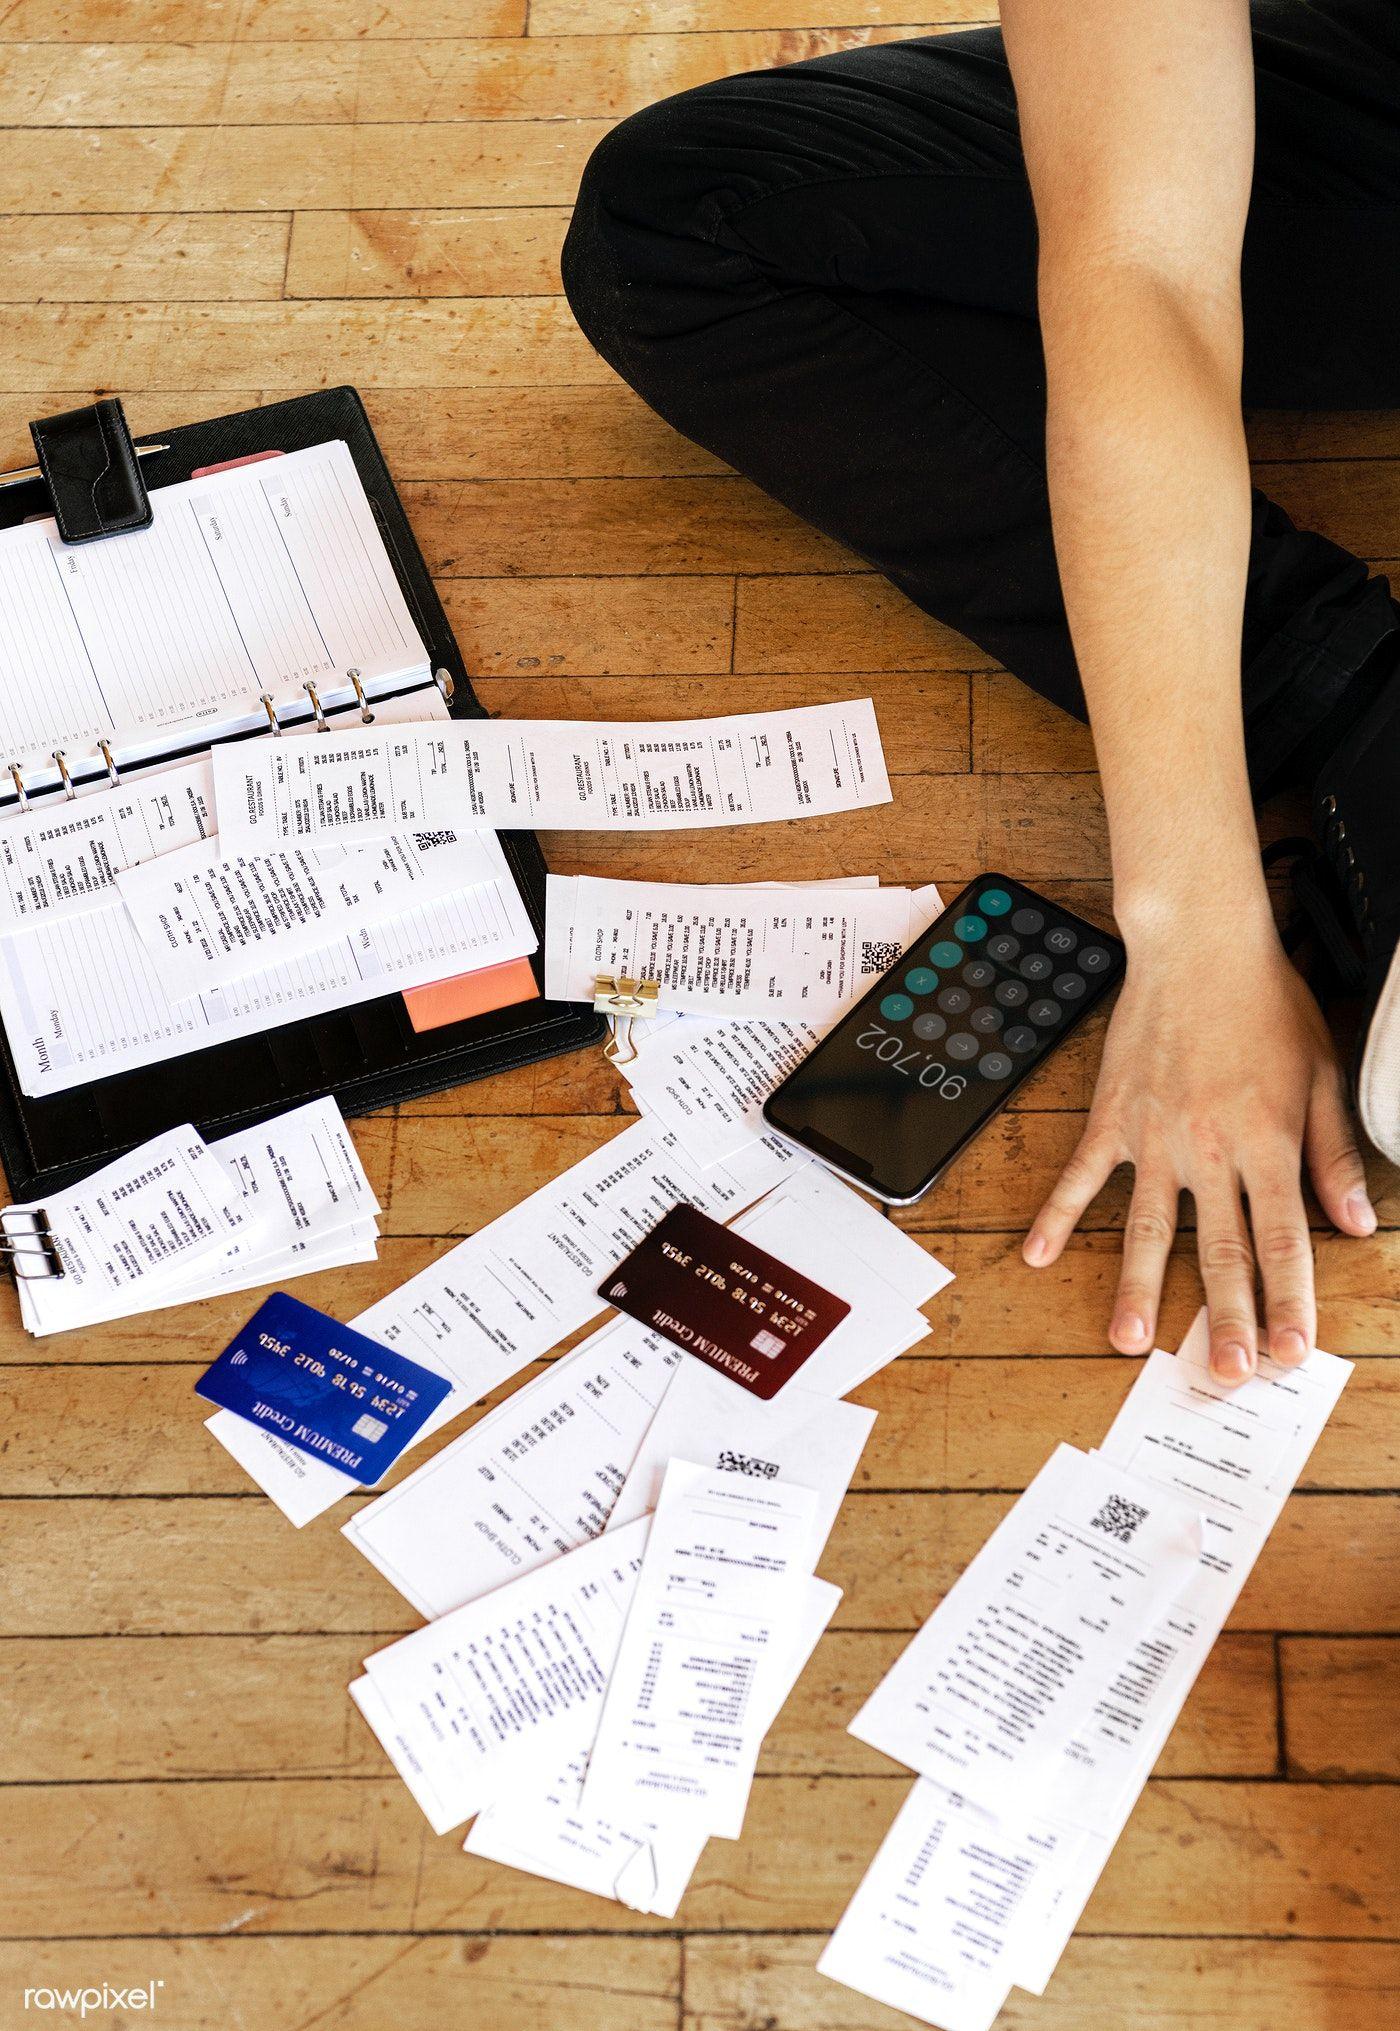 Download premium photo of paying bills online via